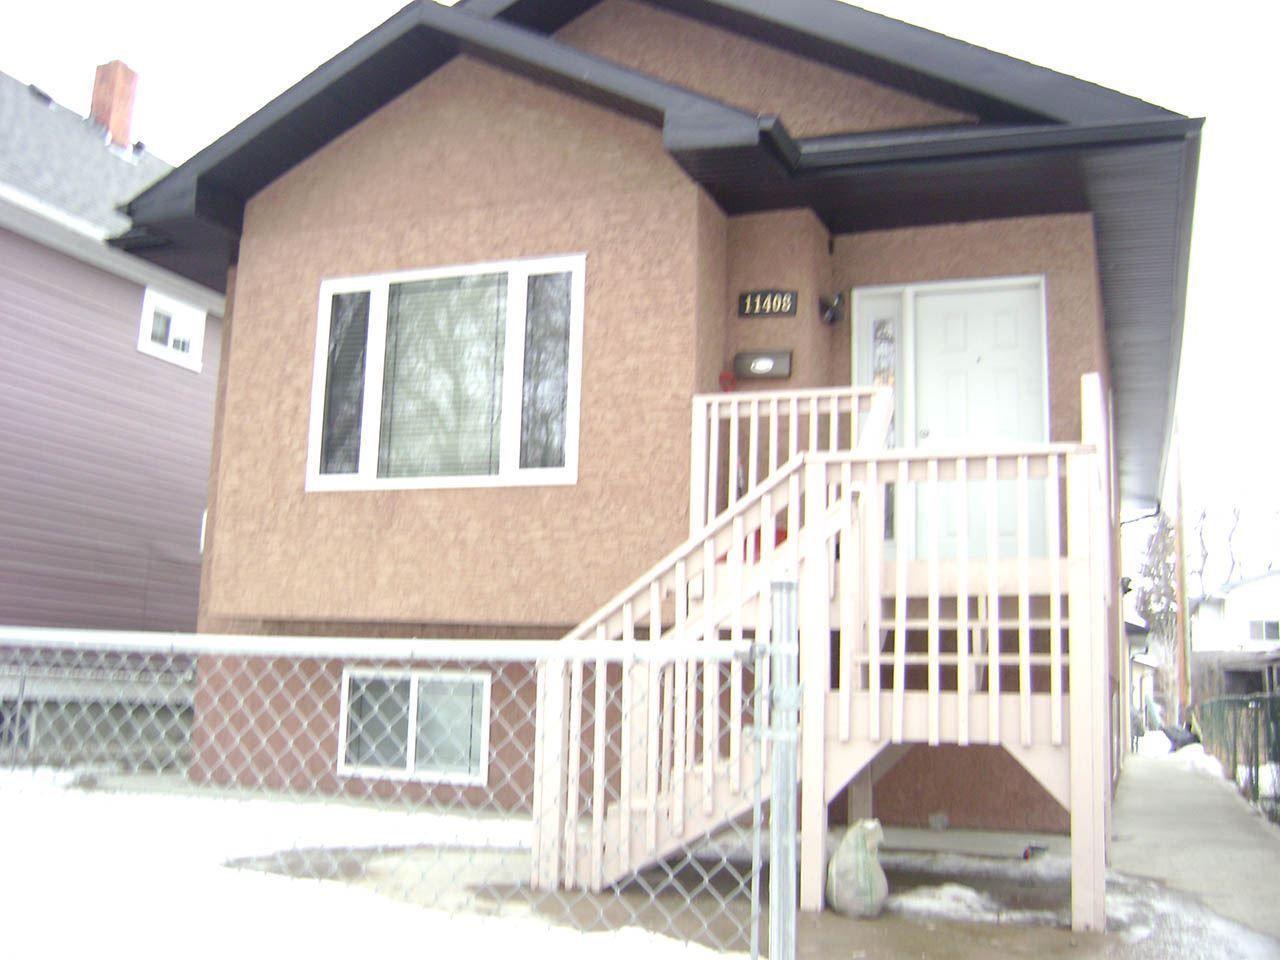 Main Photo: 11408 91 Street in Edmonton: Zone 05 House for sale : MLS®# E4121258